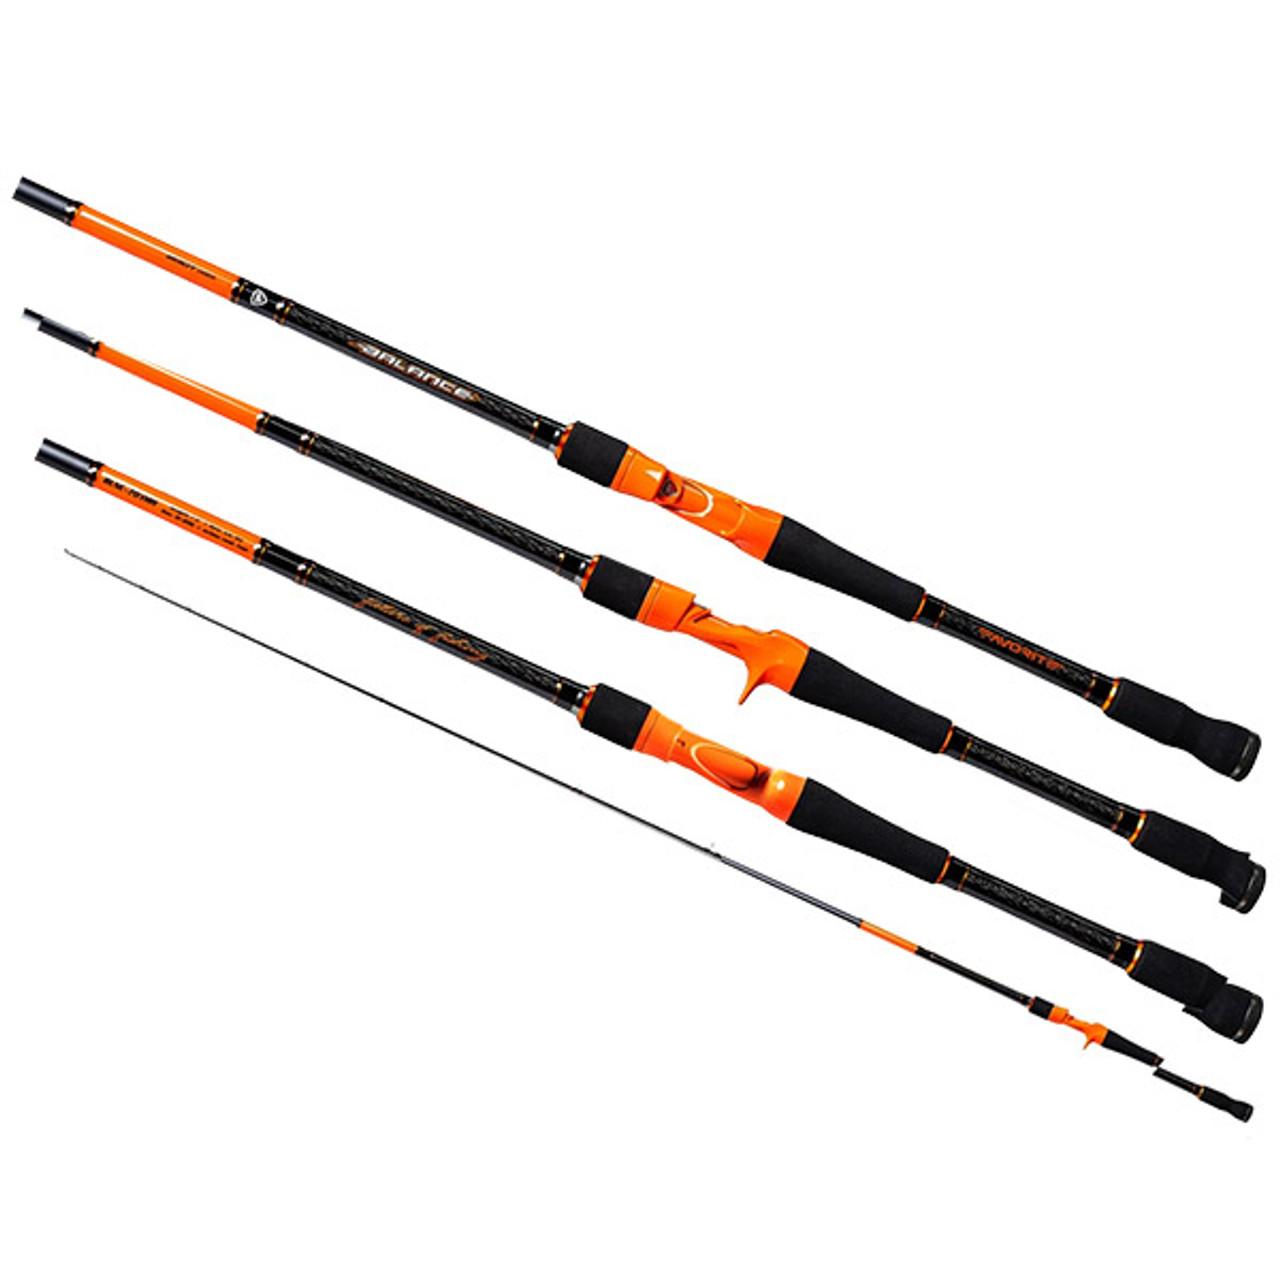 Favorite Balance Casting Rods